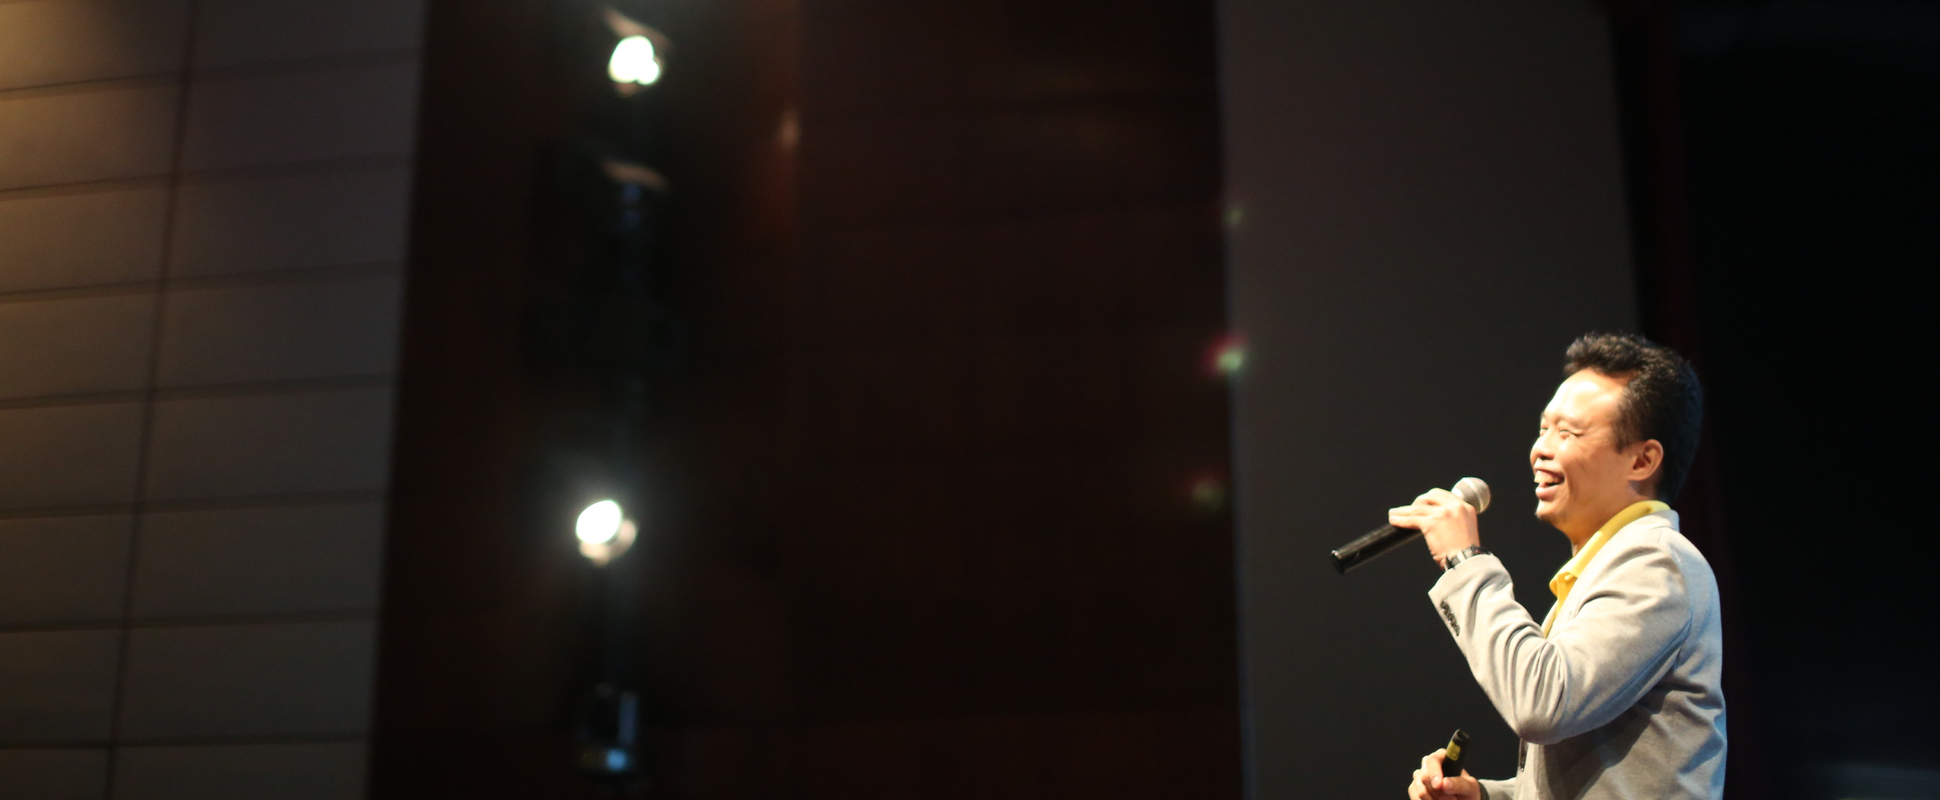 ellery ng speaking speaker stage public storify animagine singapore